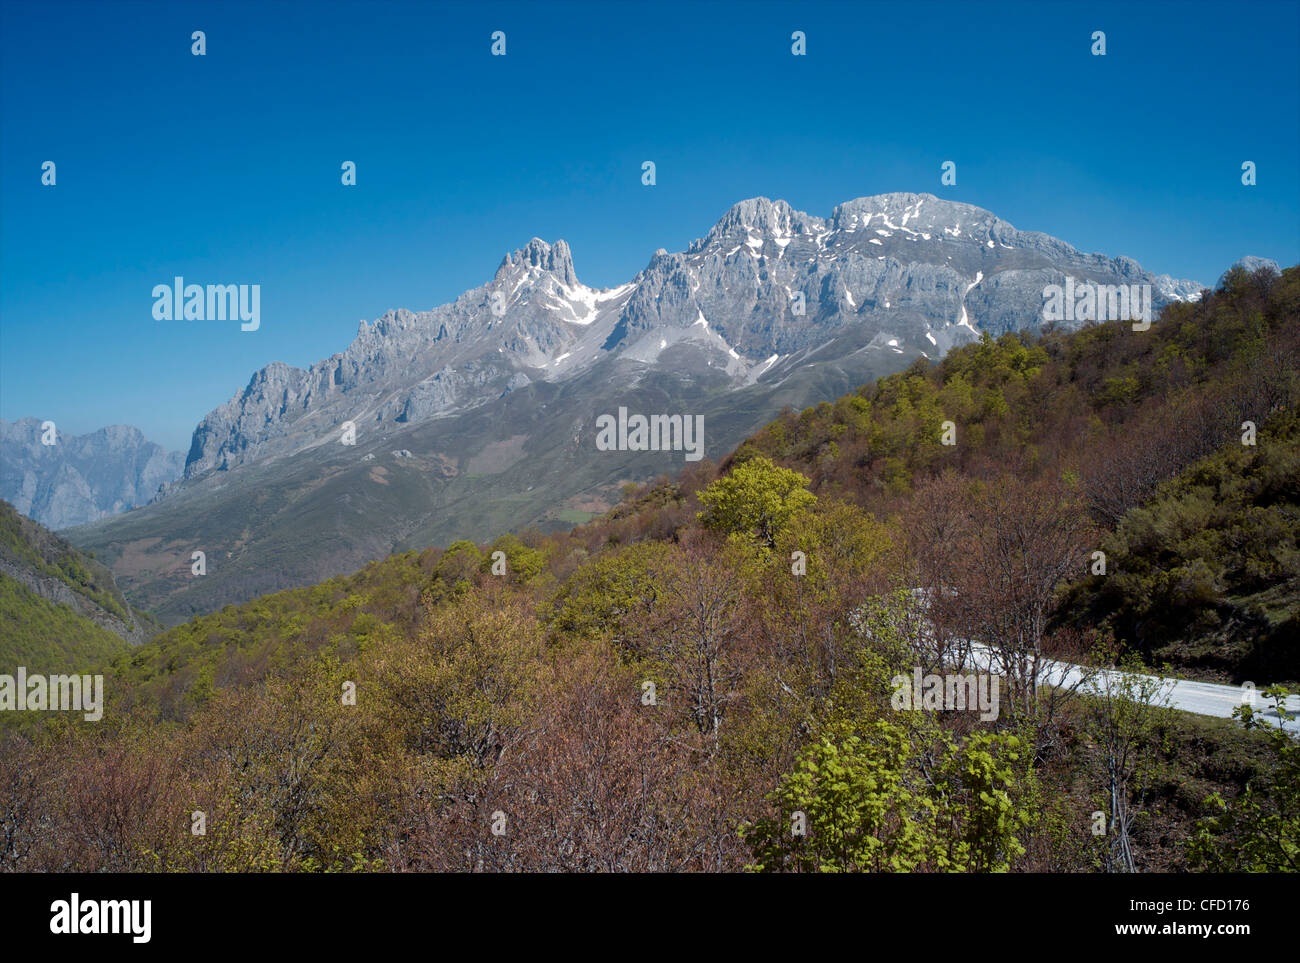 Picos de Europa, Cantabria, Spain, Europe - Stock Image